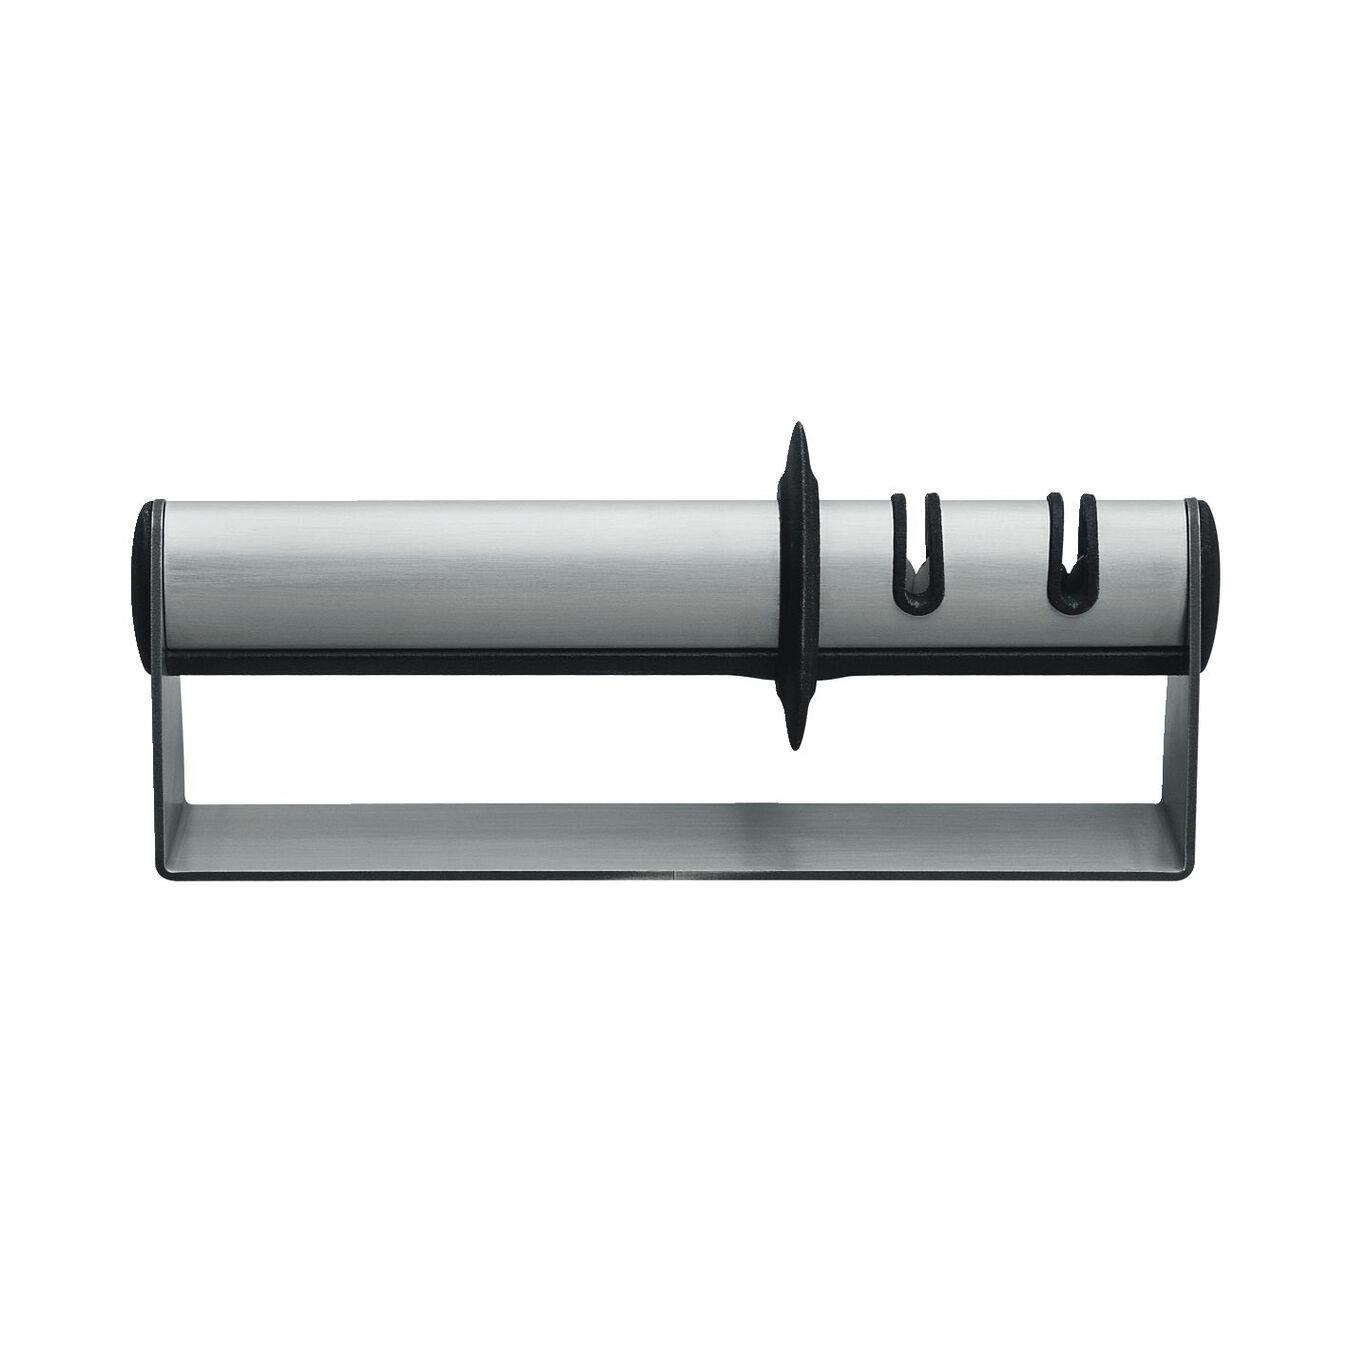 Duo Stainless Steel Handheld Knife Sharpener,,large 1